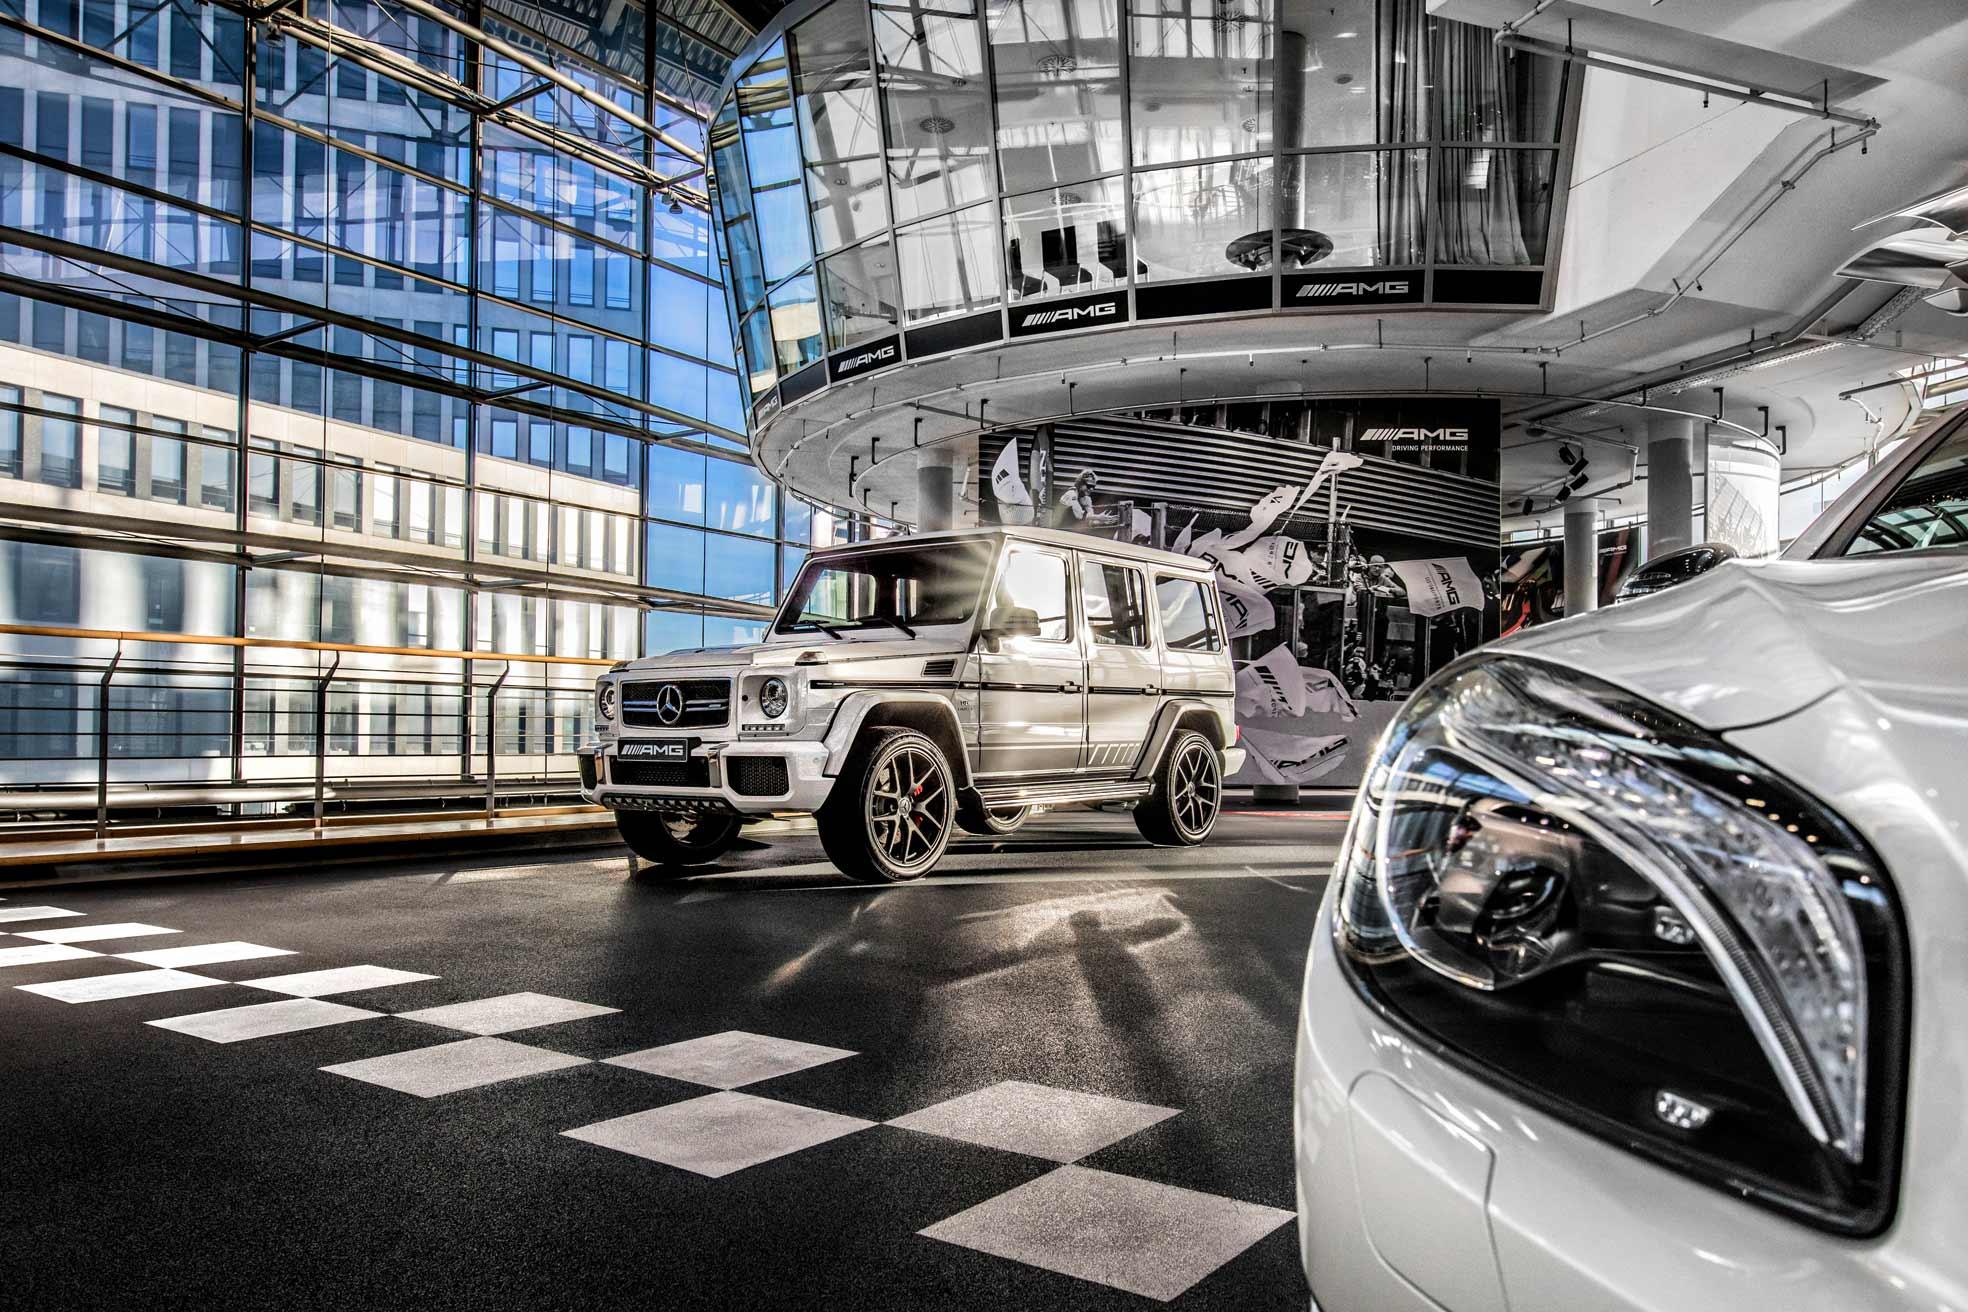 Mercedes-AMG cumple 50 años